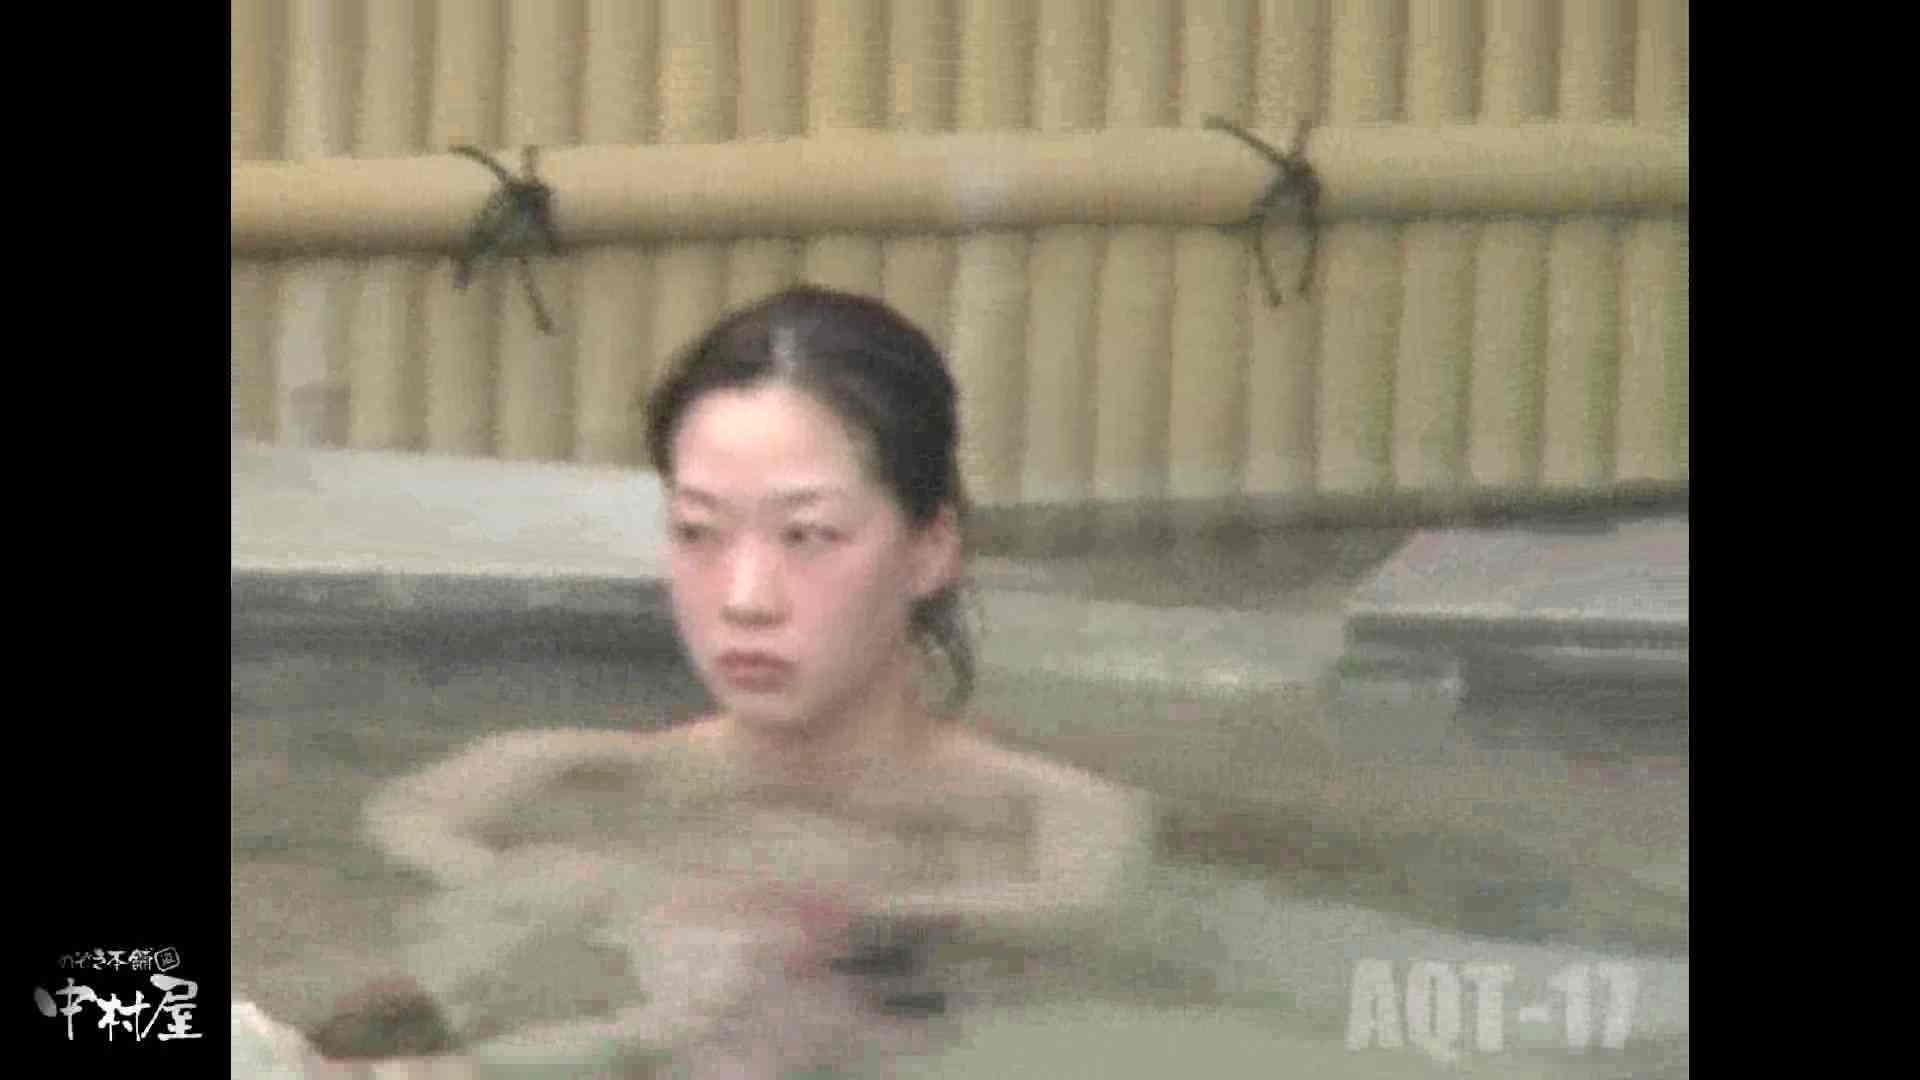 Aquaな露天風呂Vol.881潜入盗撮露天風呂十七判湯 其の一 盗撮特集   露天  68画像 20